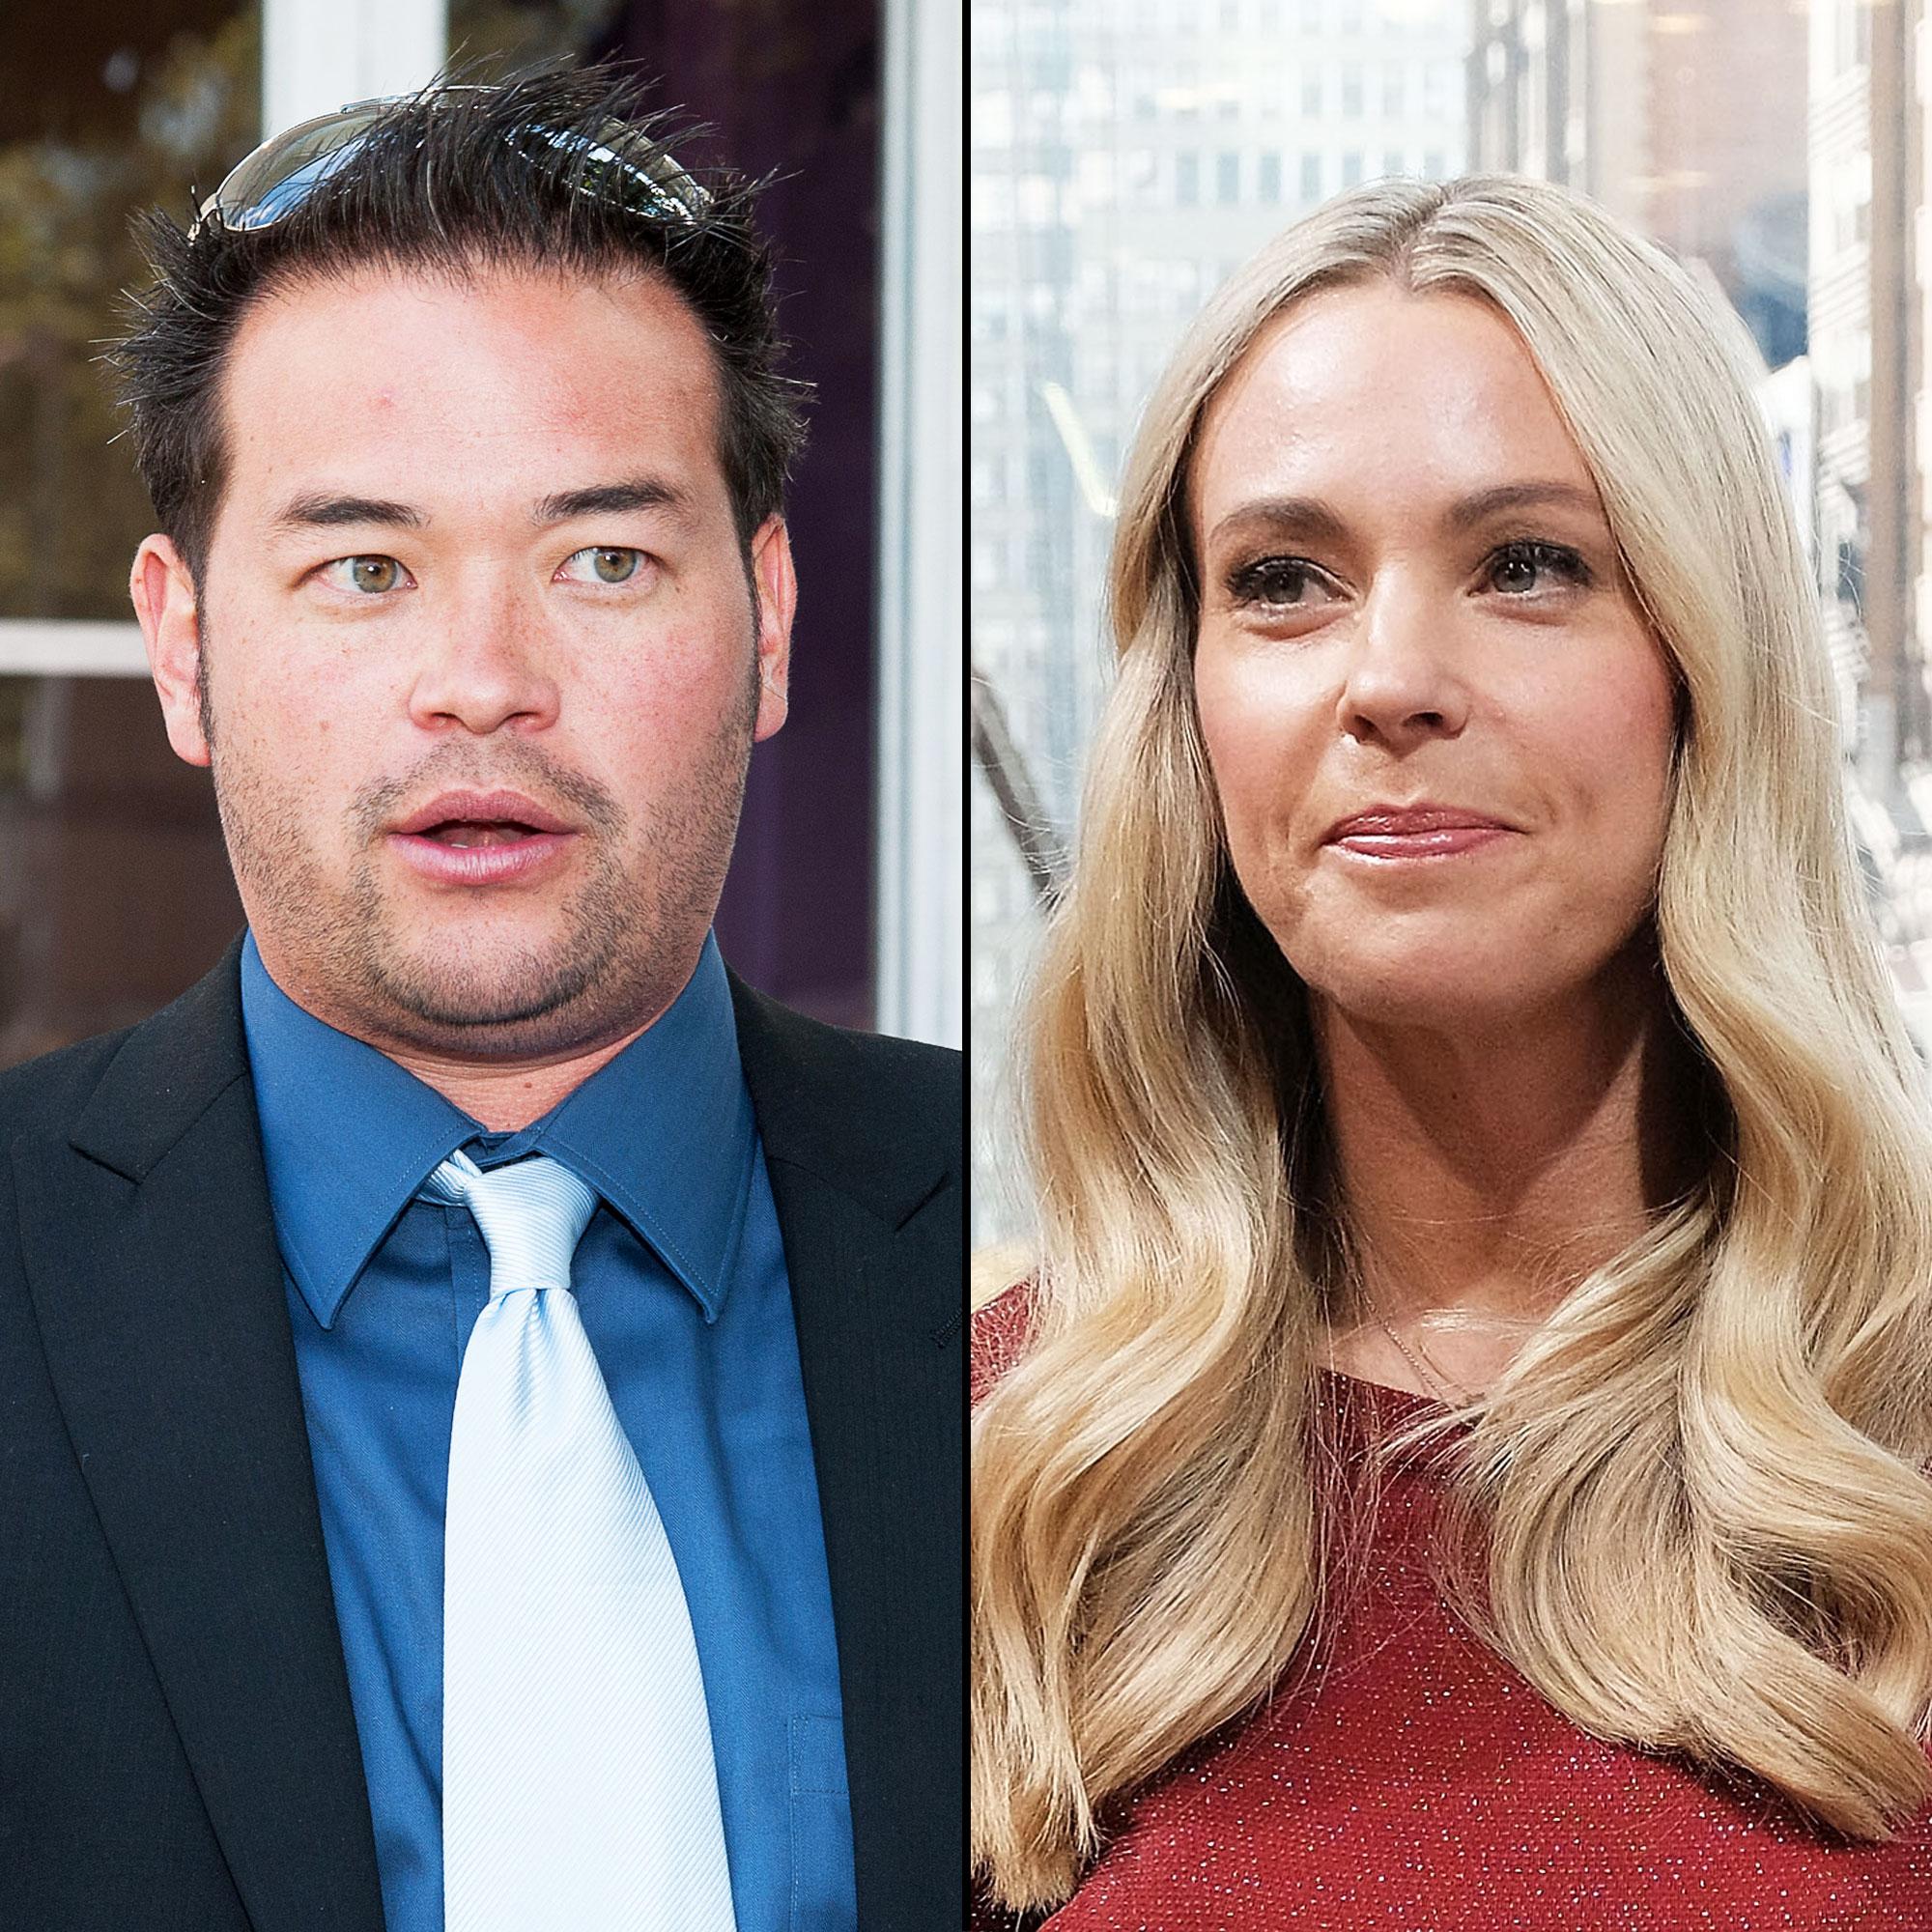 Jon Gosselin Claims Ex Kate Gosselin Has 'Zero' Interaction With Their Son Collin - Jon Gosselin and Kate Gosselin